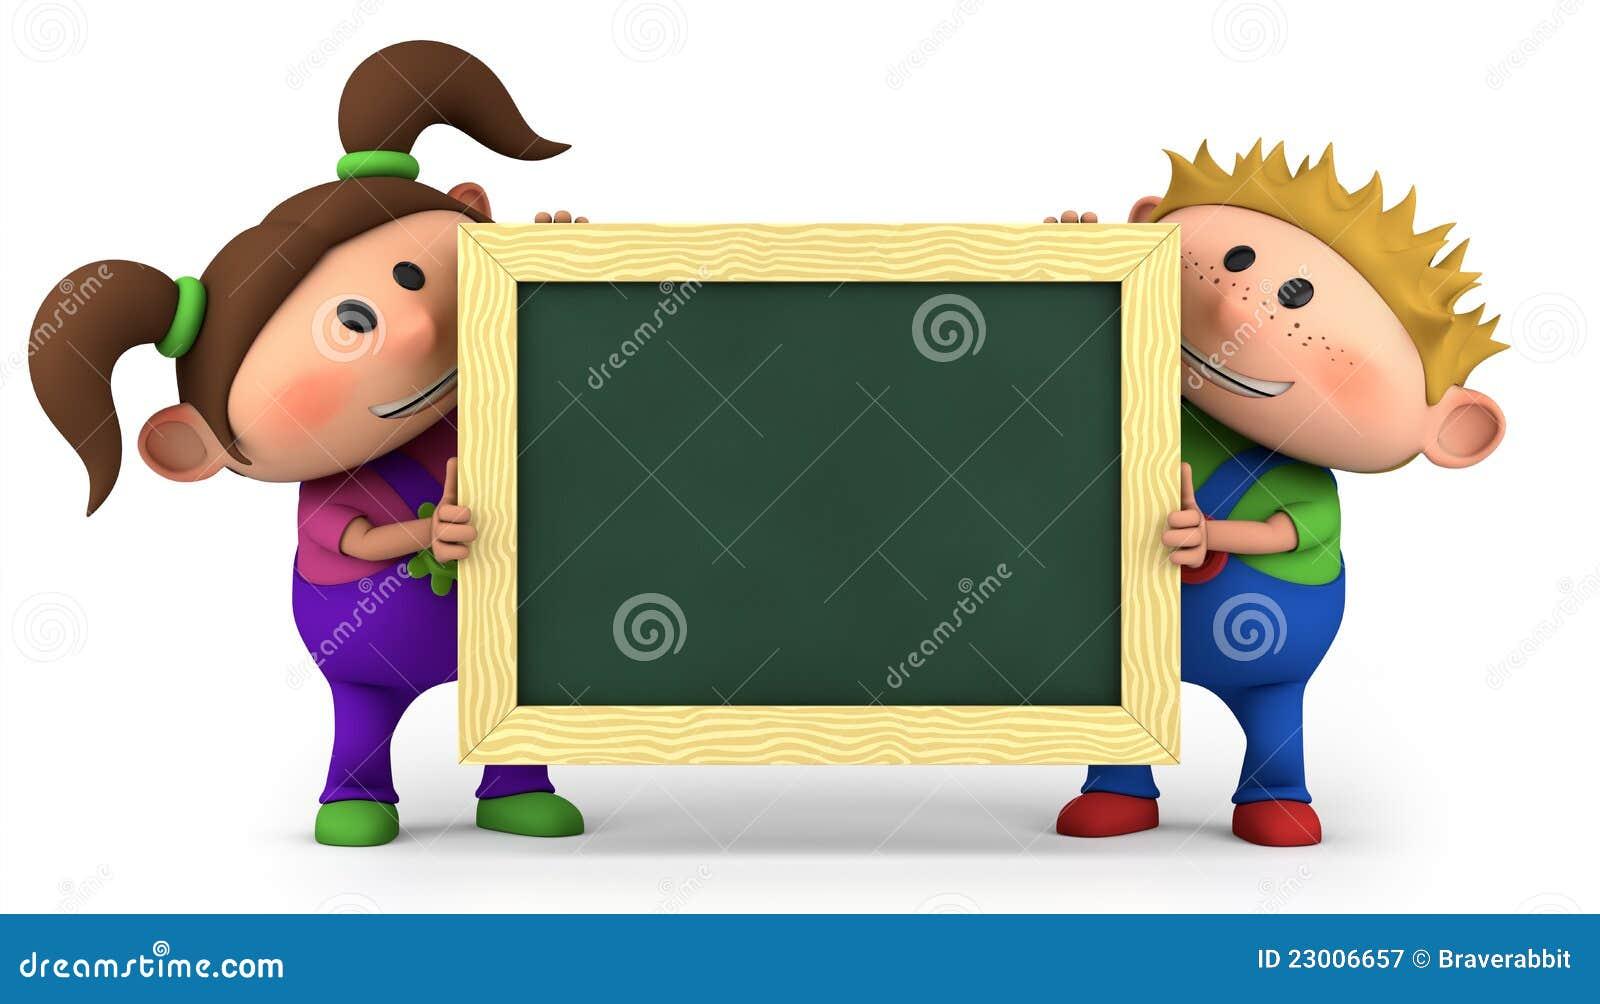 A scuola schoolgirl - 3 2